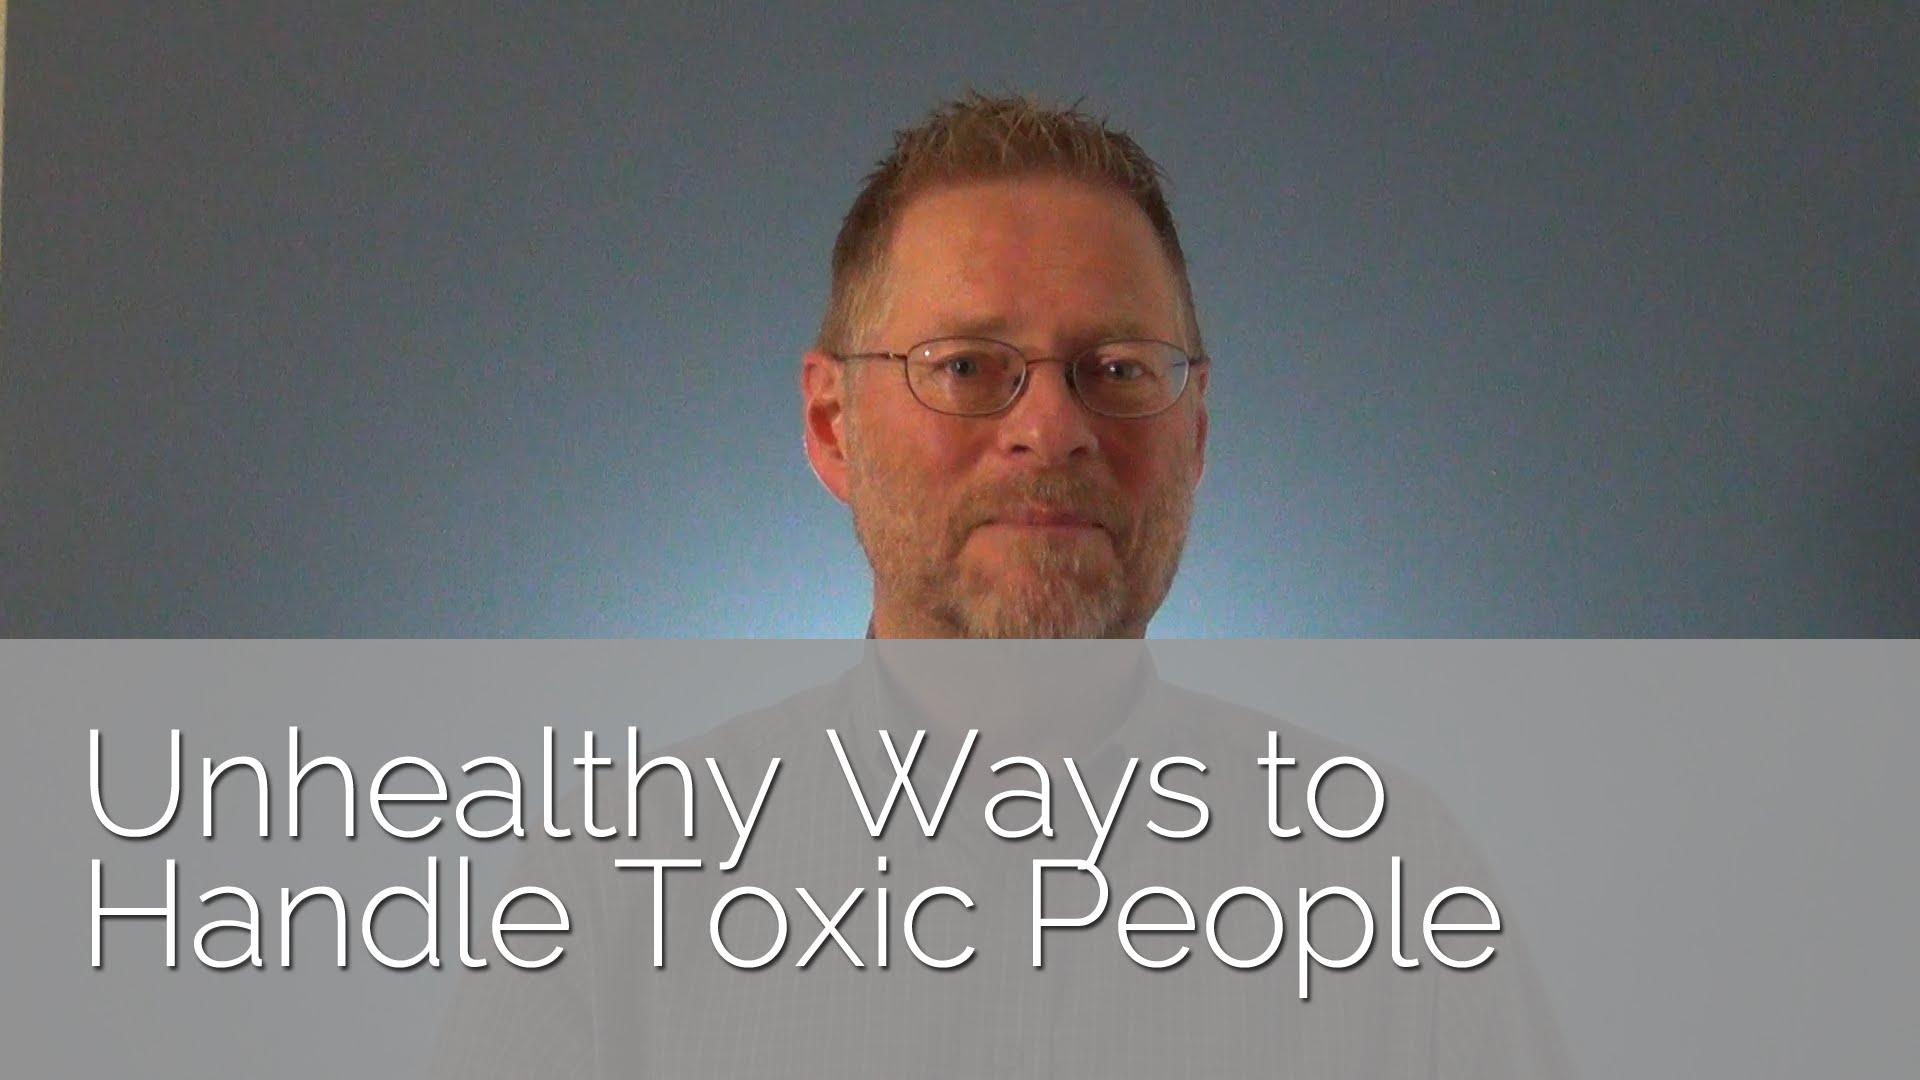 Unhealthy Ways to Handle Toxic People